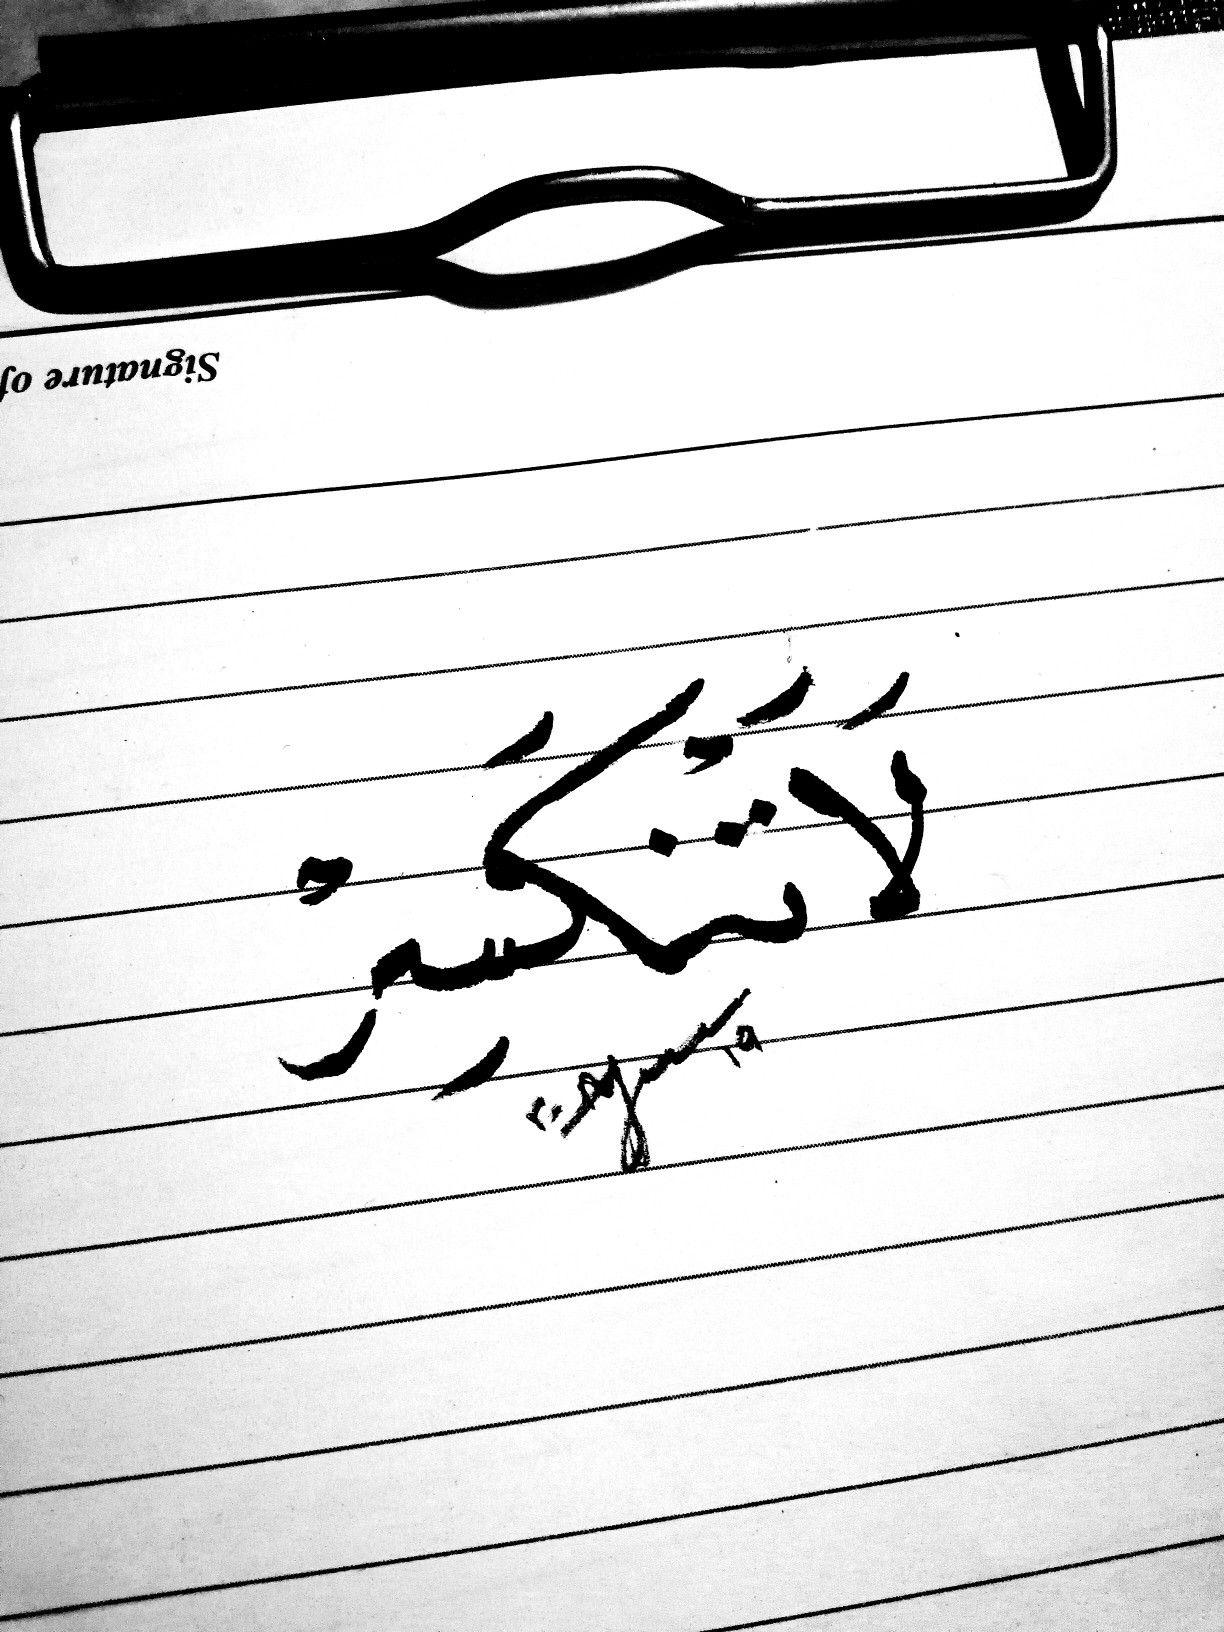 لا تنكسر استند على نفسك وقف مجددا Arabic Calligraphy Calligraphy Handwriting